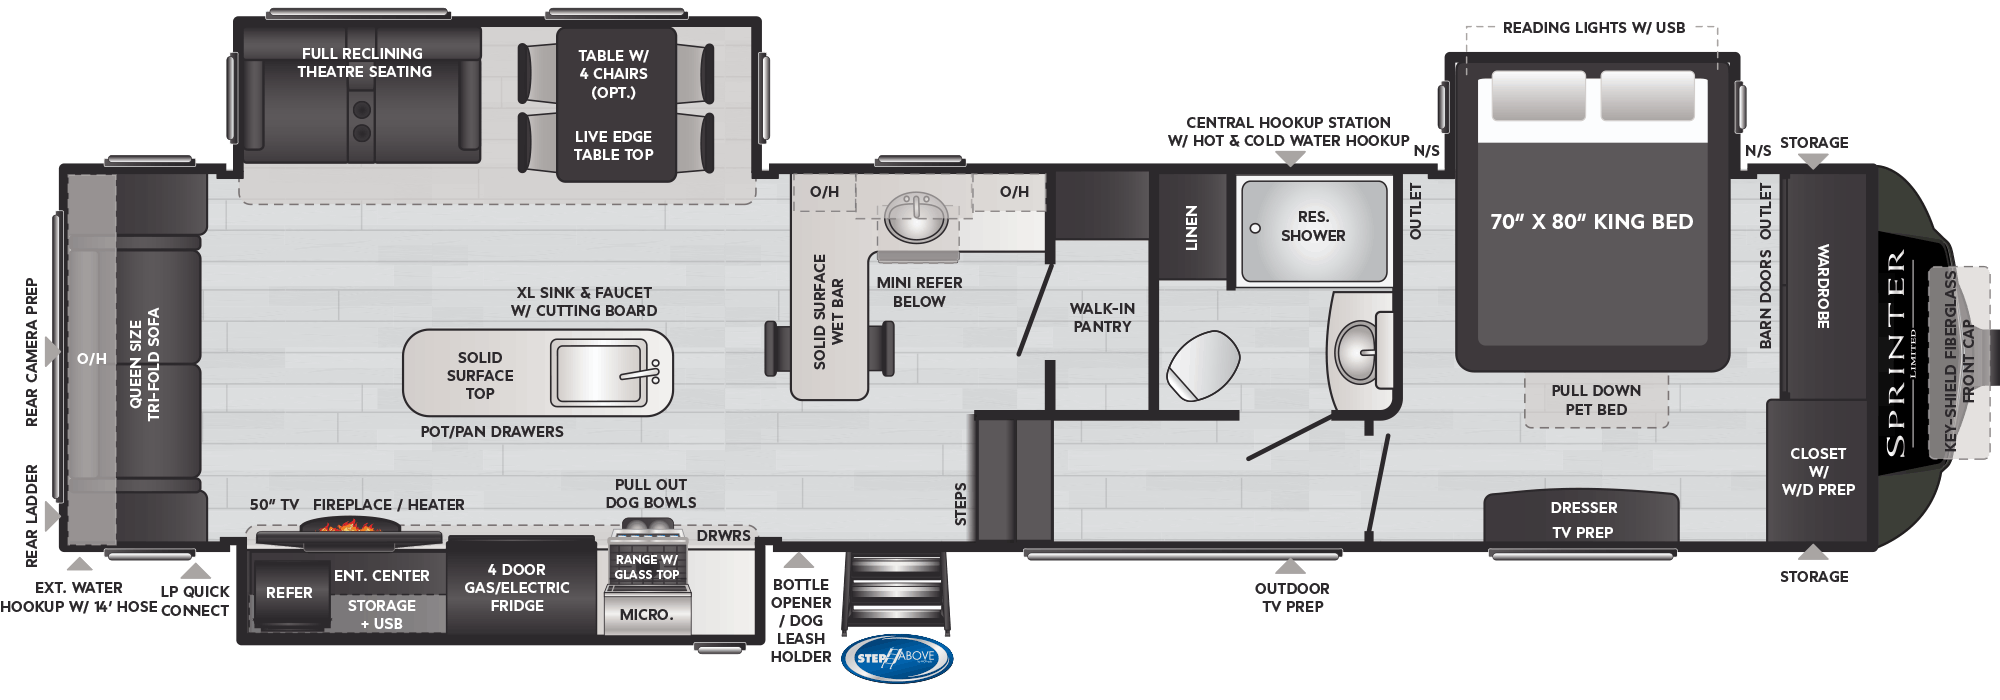 Floor Plan: 2020 Sprinter 3560FWRLB